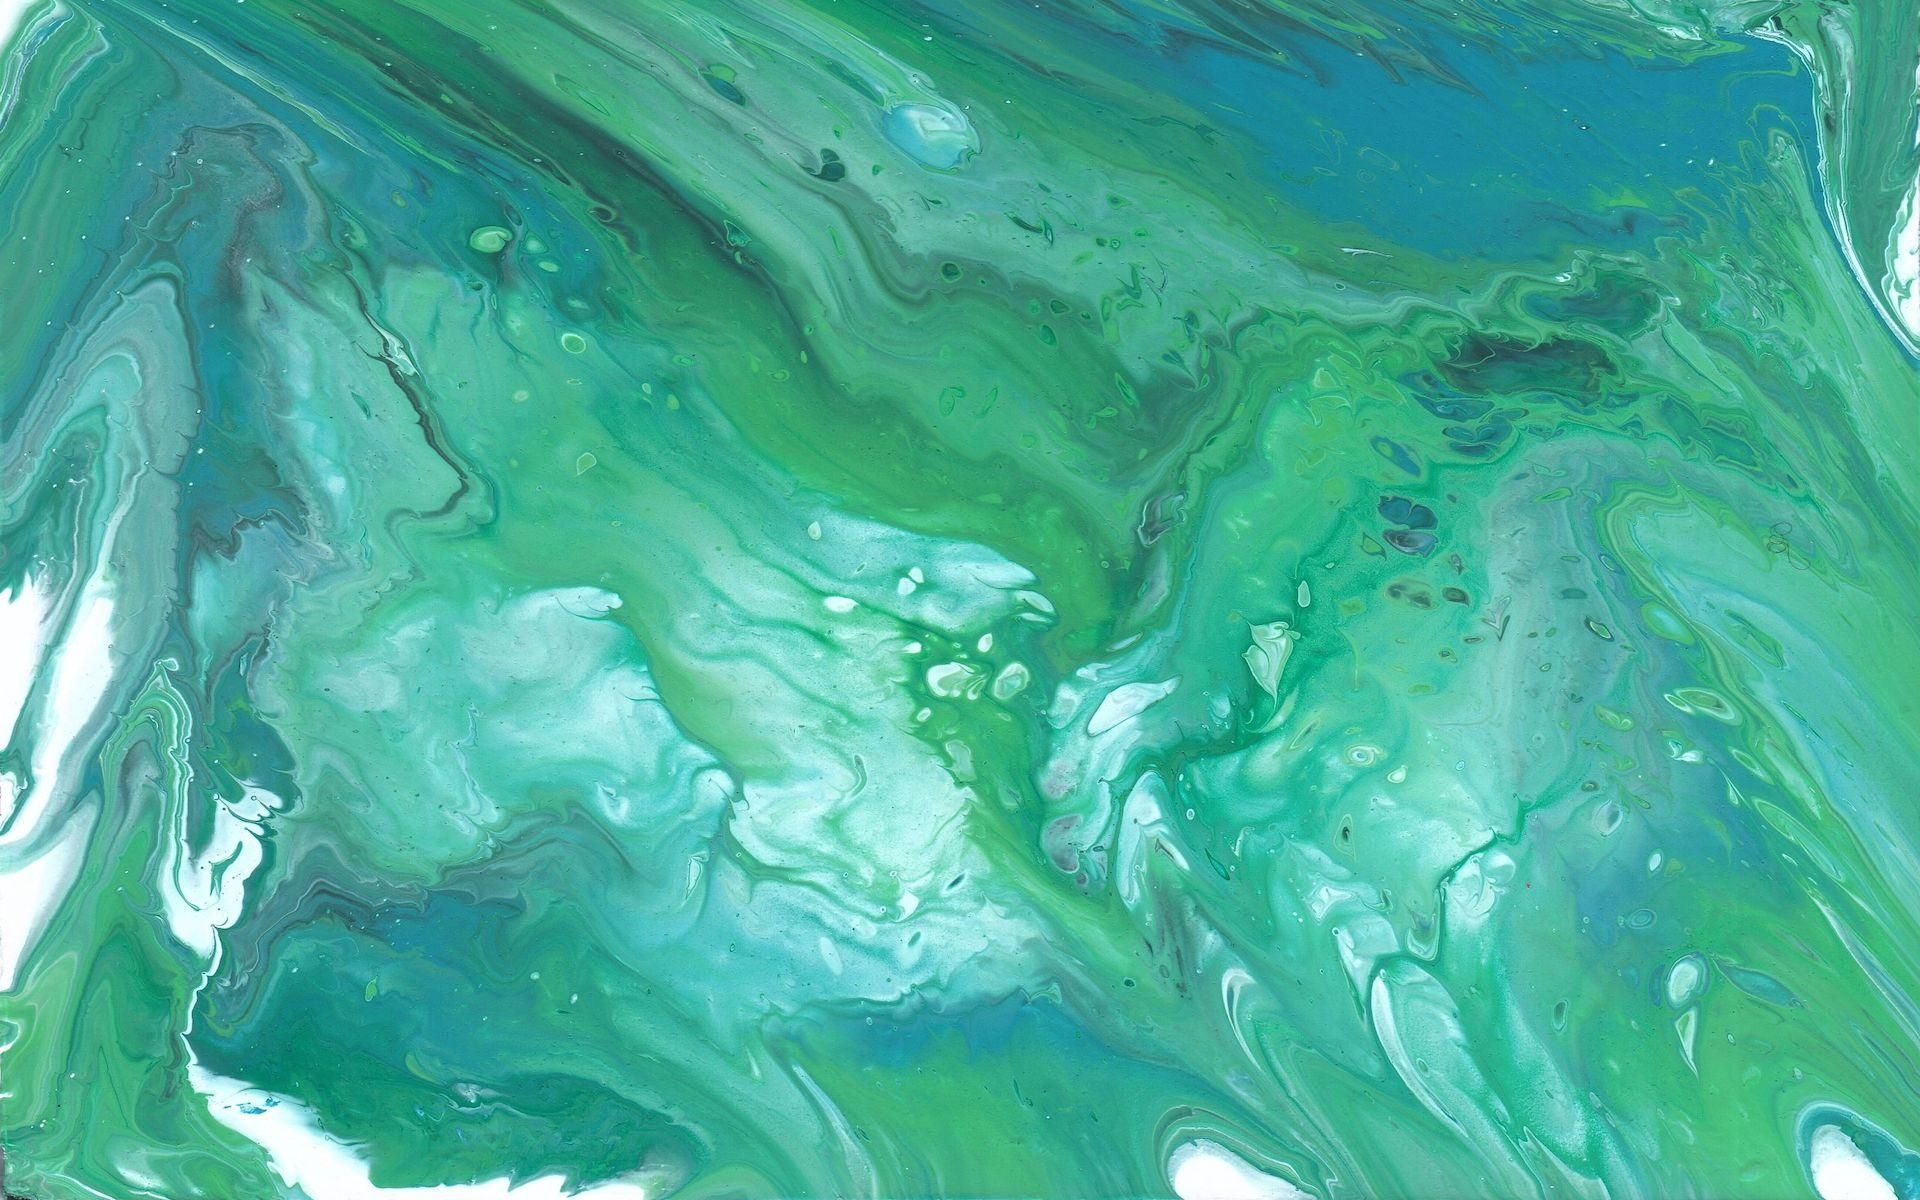 Green Marble Desktop Wallpapers Top Free Green Marble Desktop